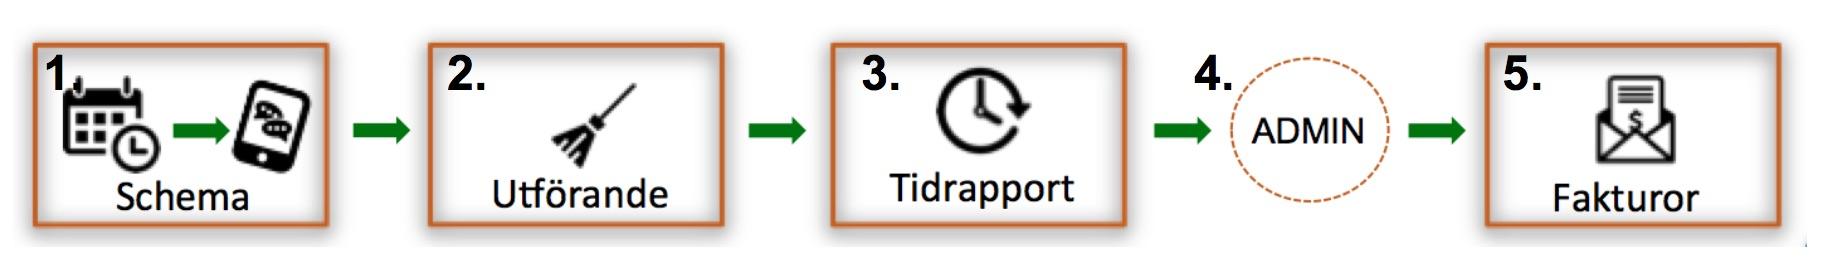 TimeWave affärssystem - god